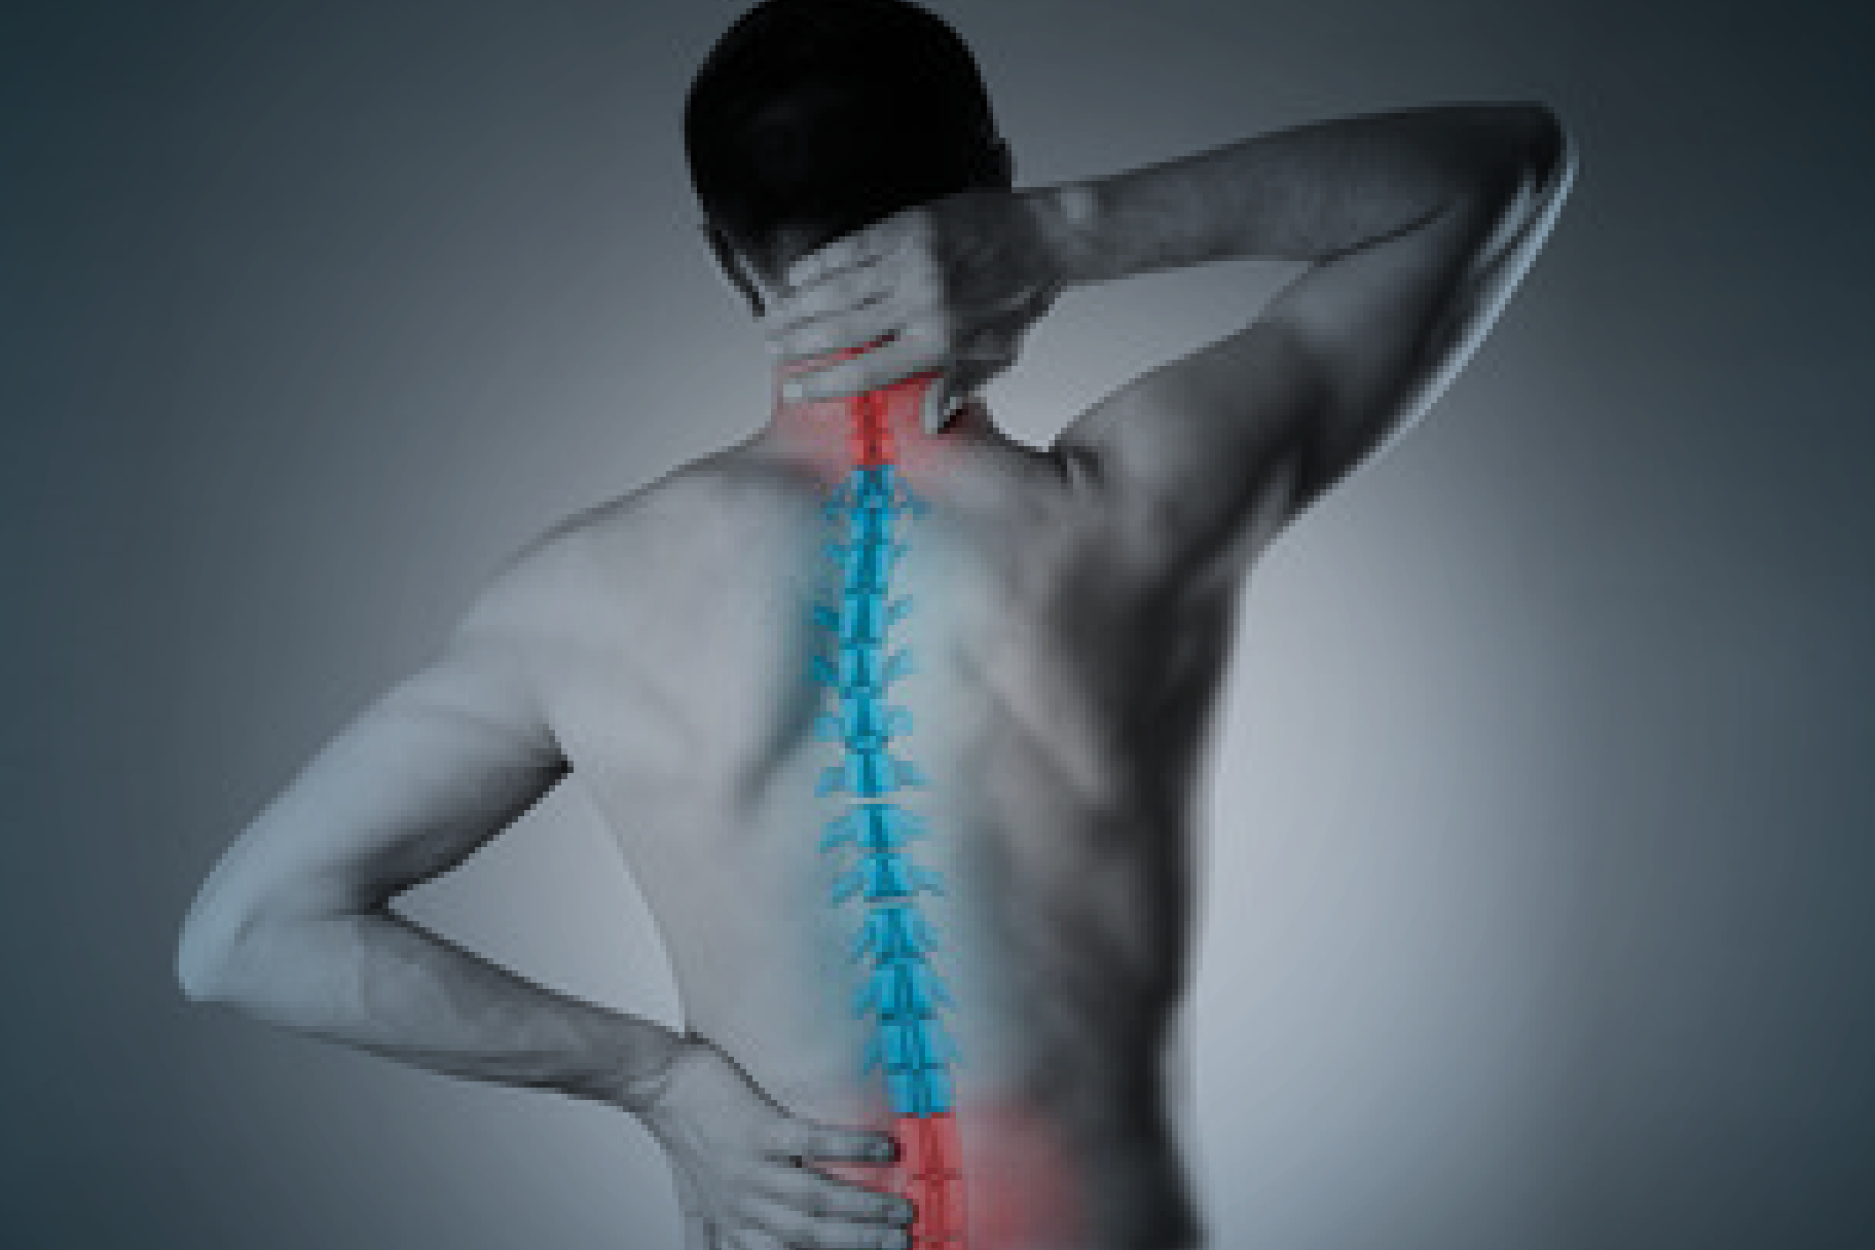 Avala-WebImages-Health-SpineRobotic